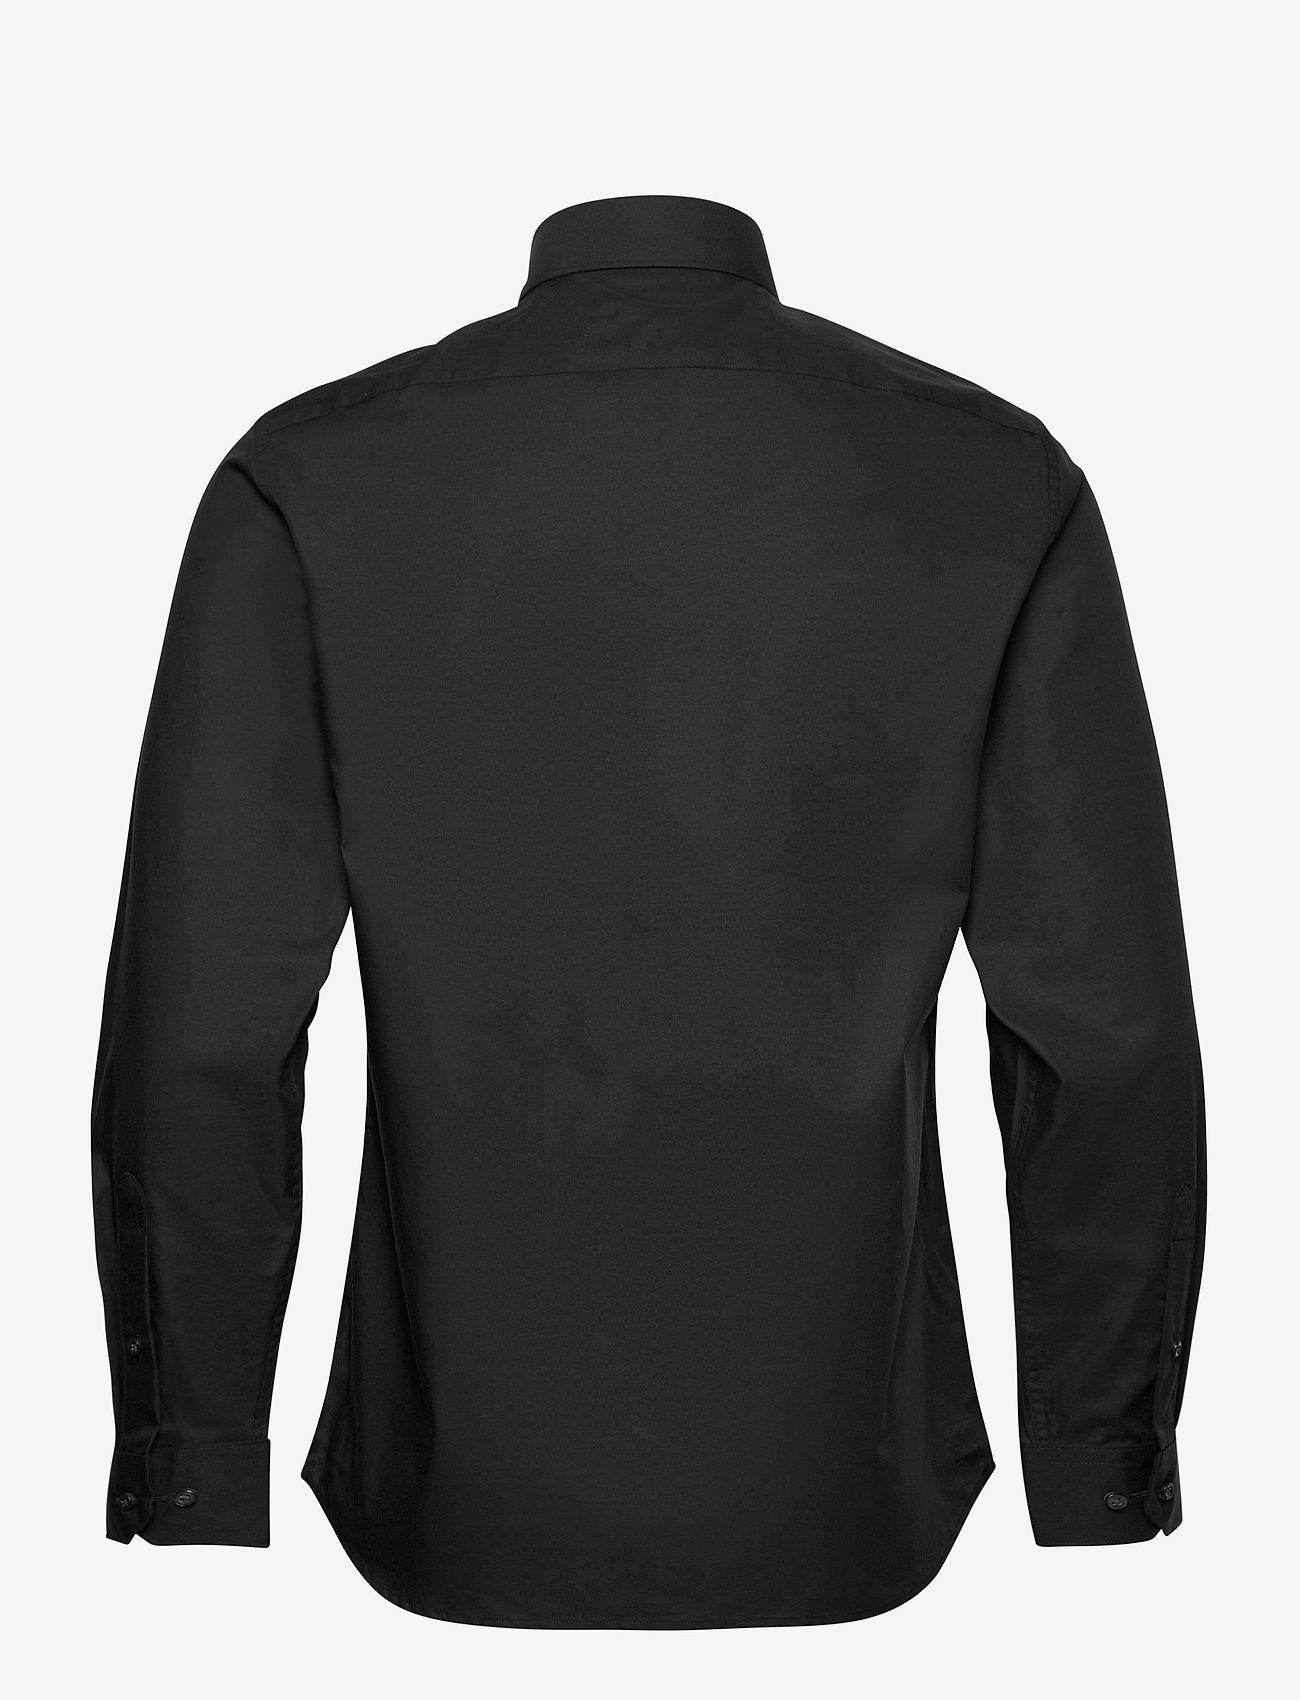 Jack & Jones - JPRBLAROYAL SHIRT L/S - basic skjortor - black - 1